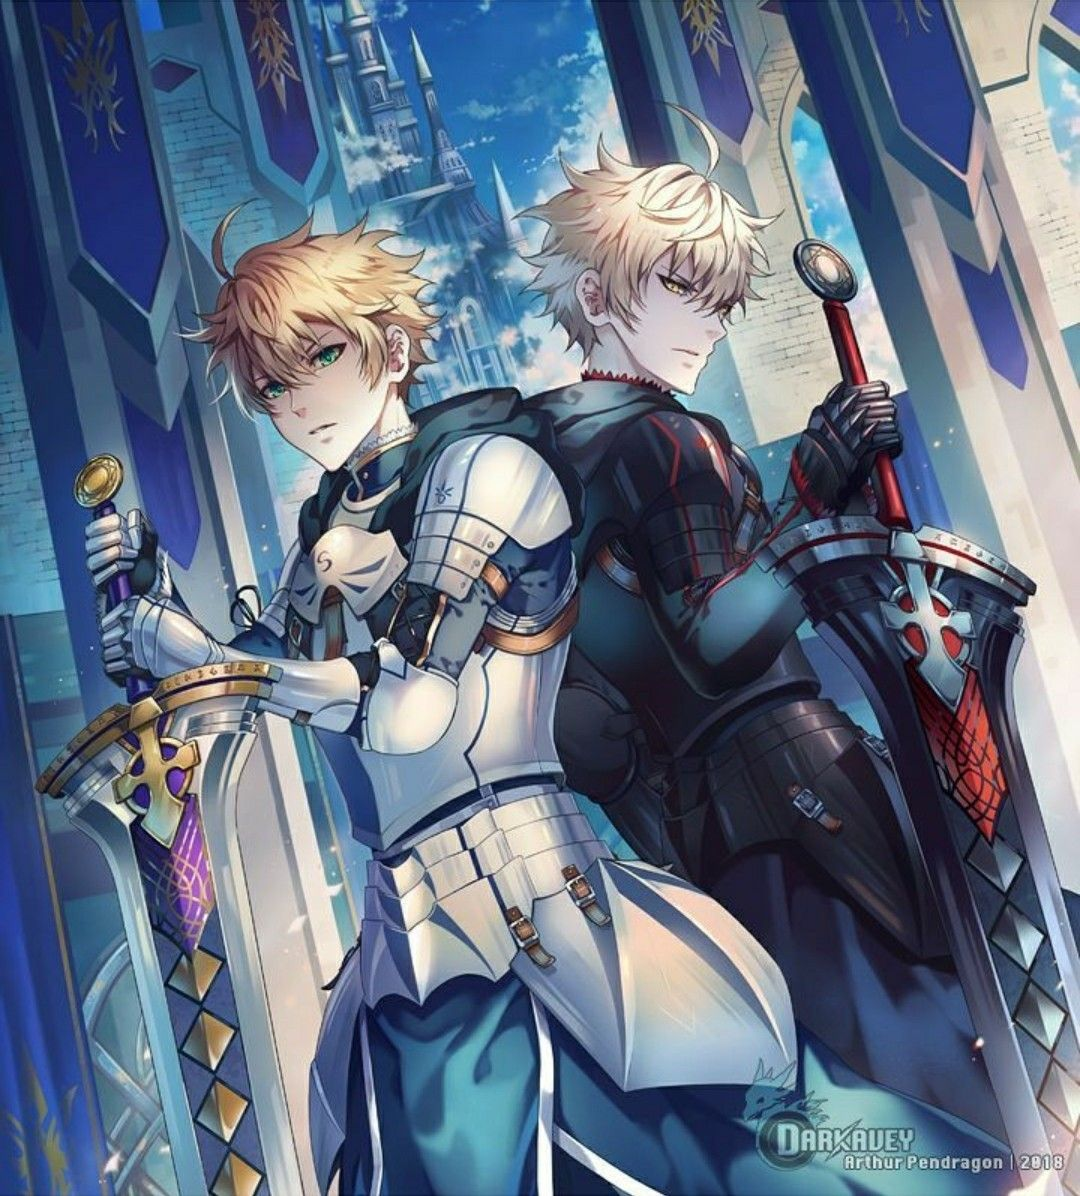 Arthur Pendragon Alter FATE (Series) Fate anime series